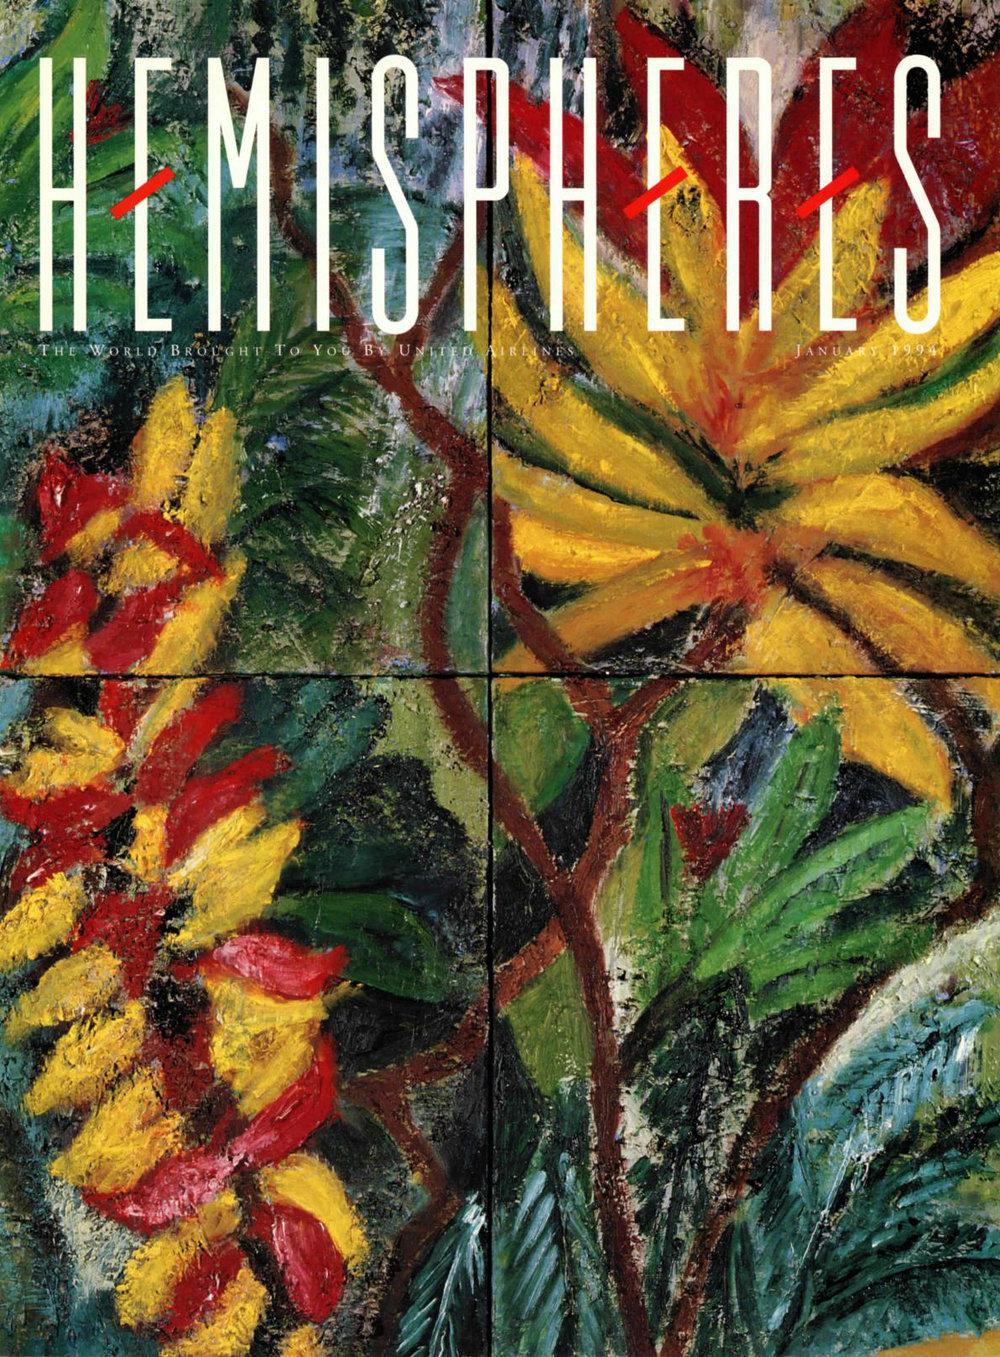 United Airlines' Hemispheres Magazine - May 1994